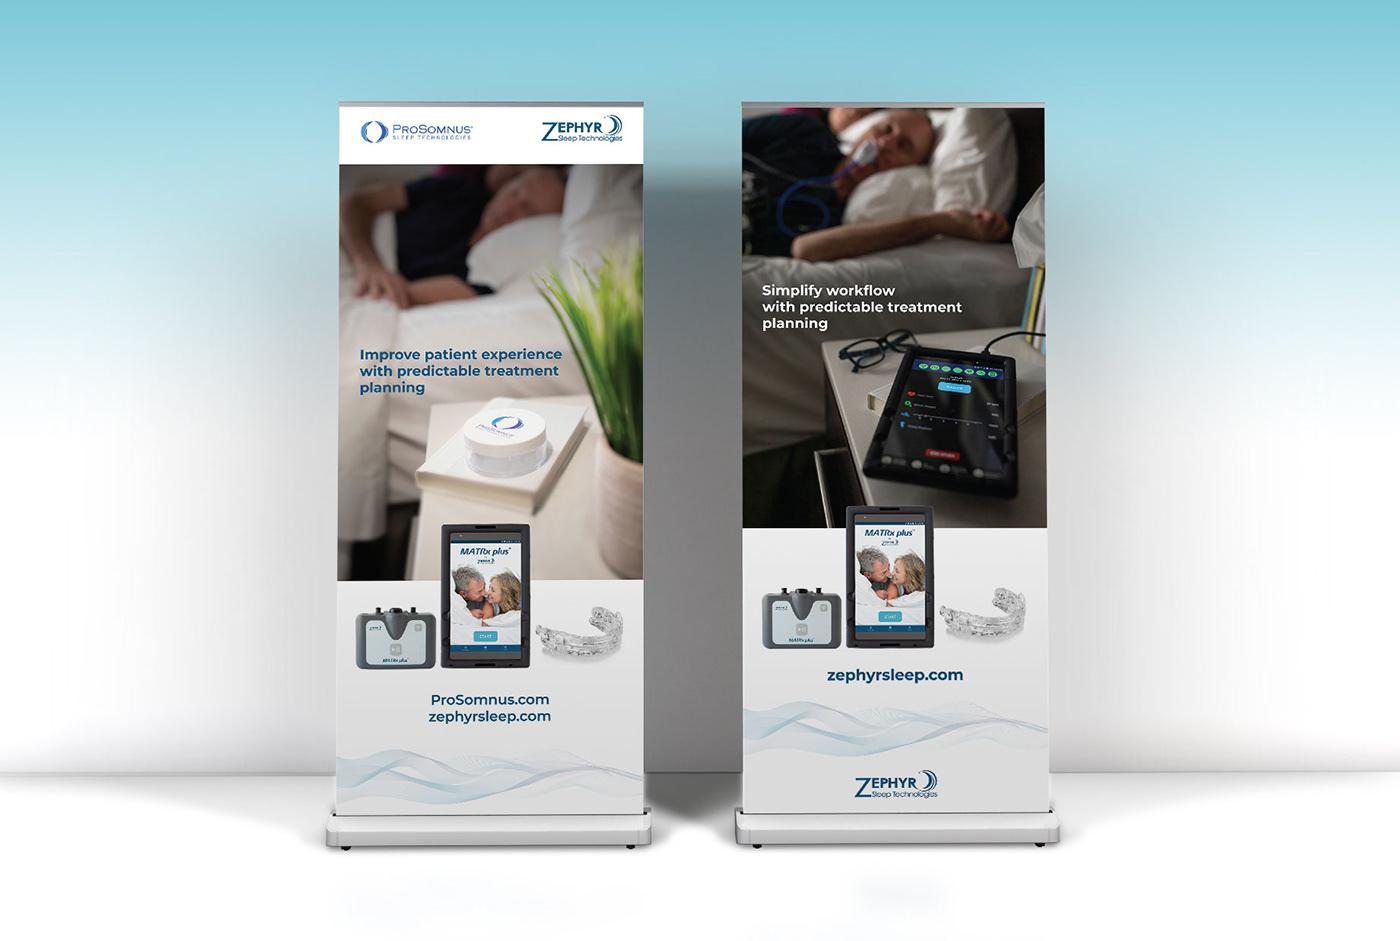 apnea,banner,dental,sleep,Technology